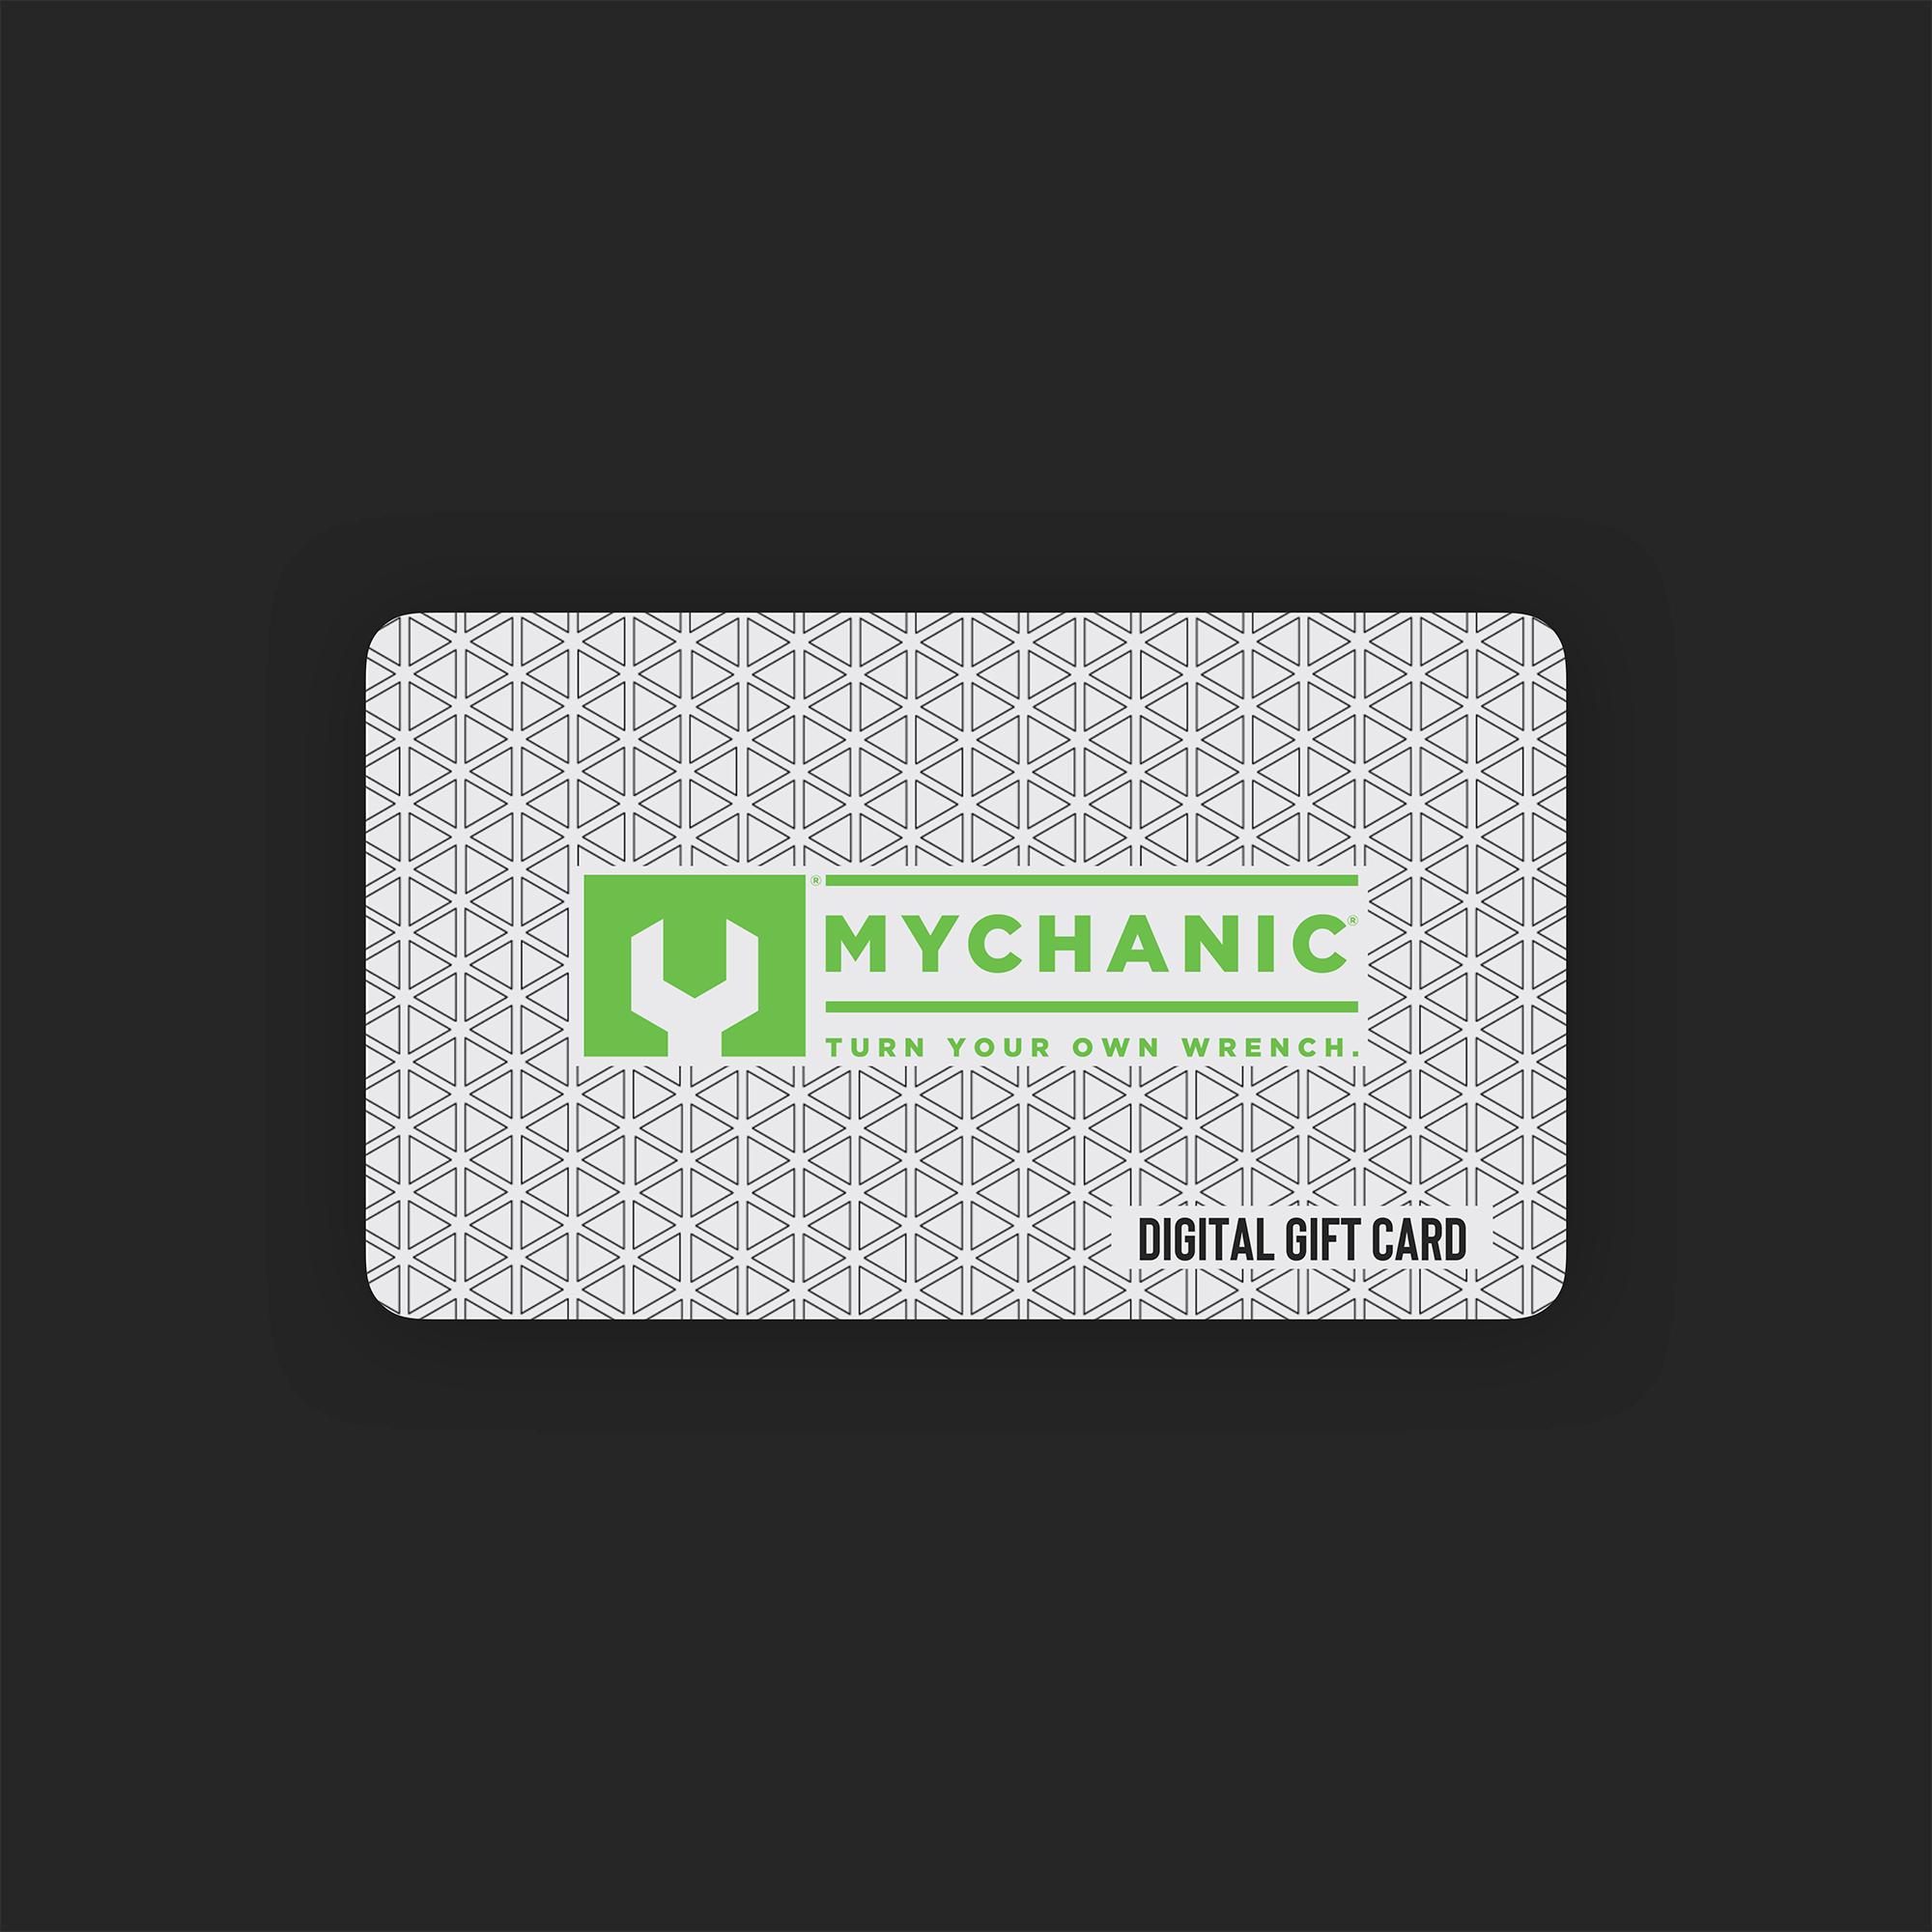 MYCHANIC Gift Card